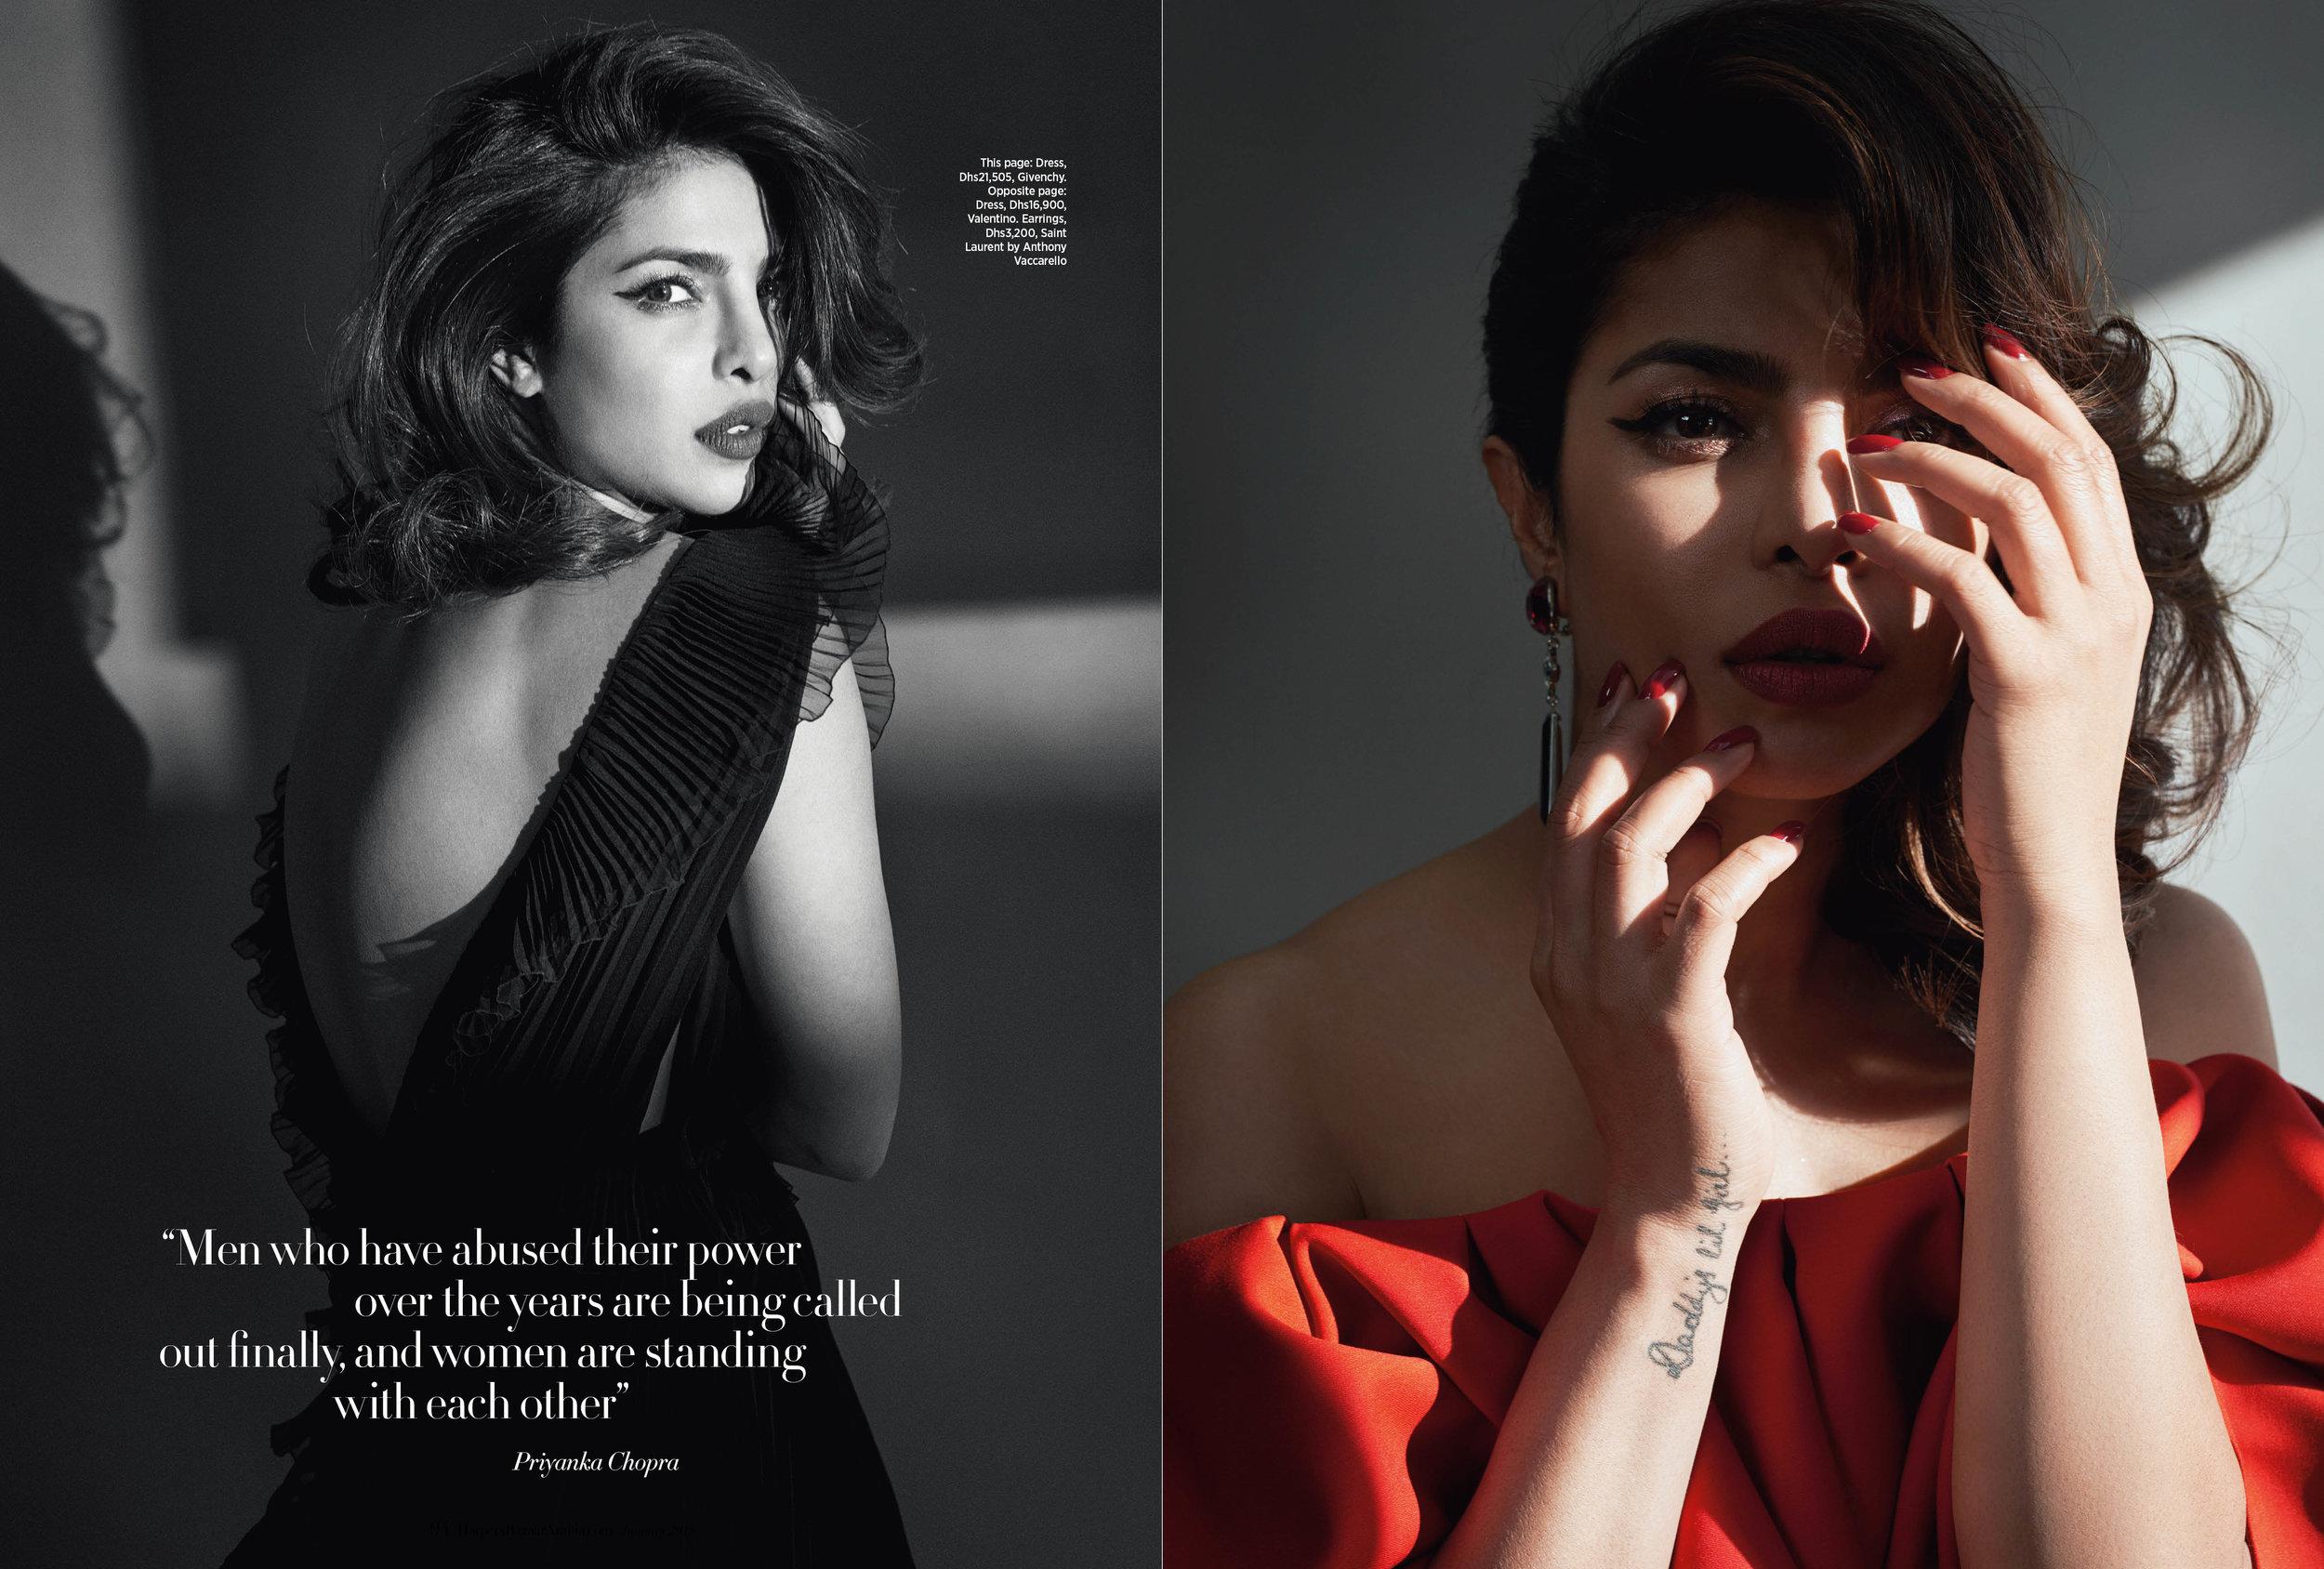 Priyanka Chopra, February 2018 3.jpg